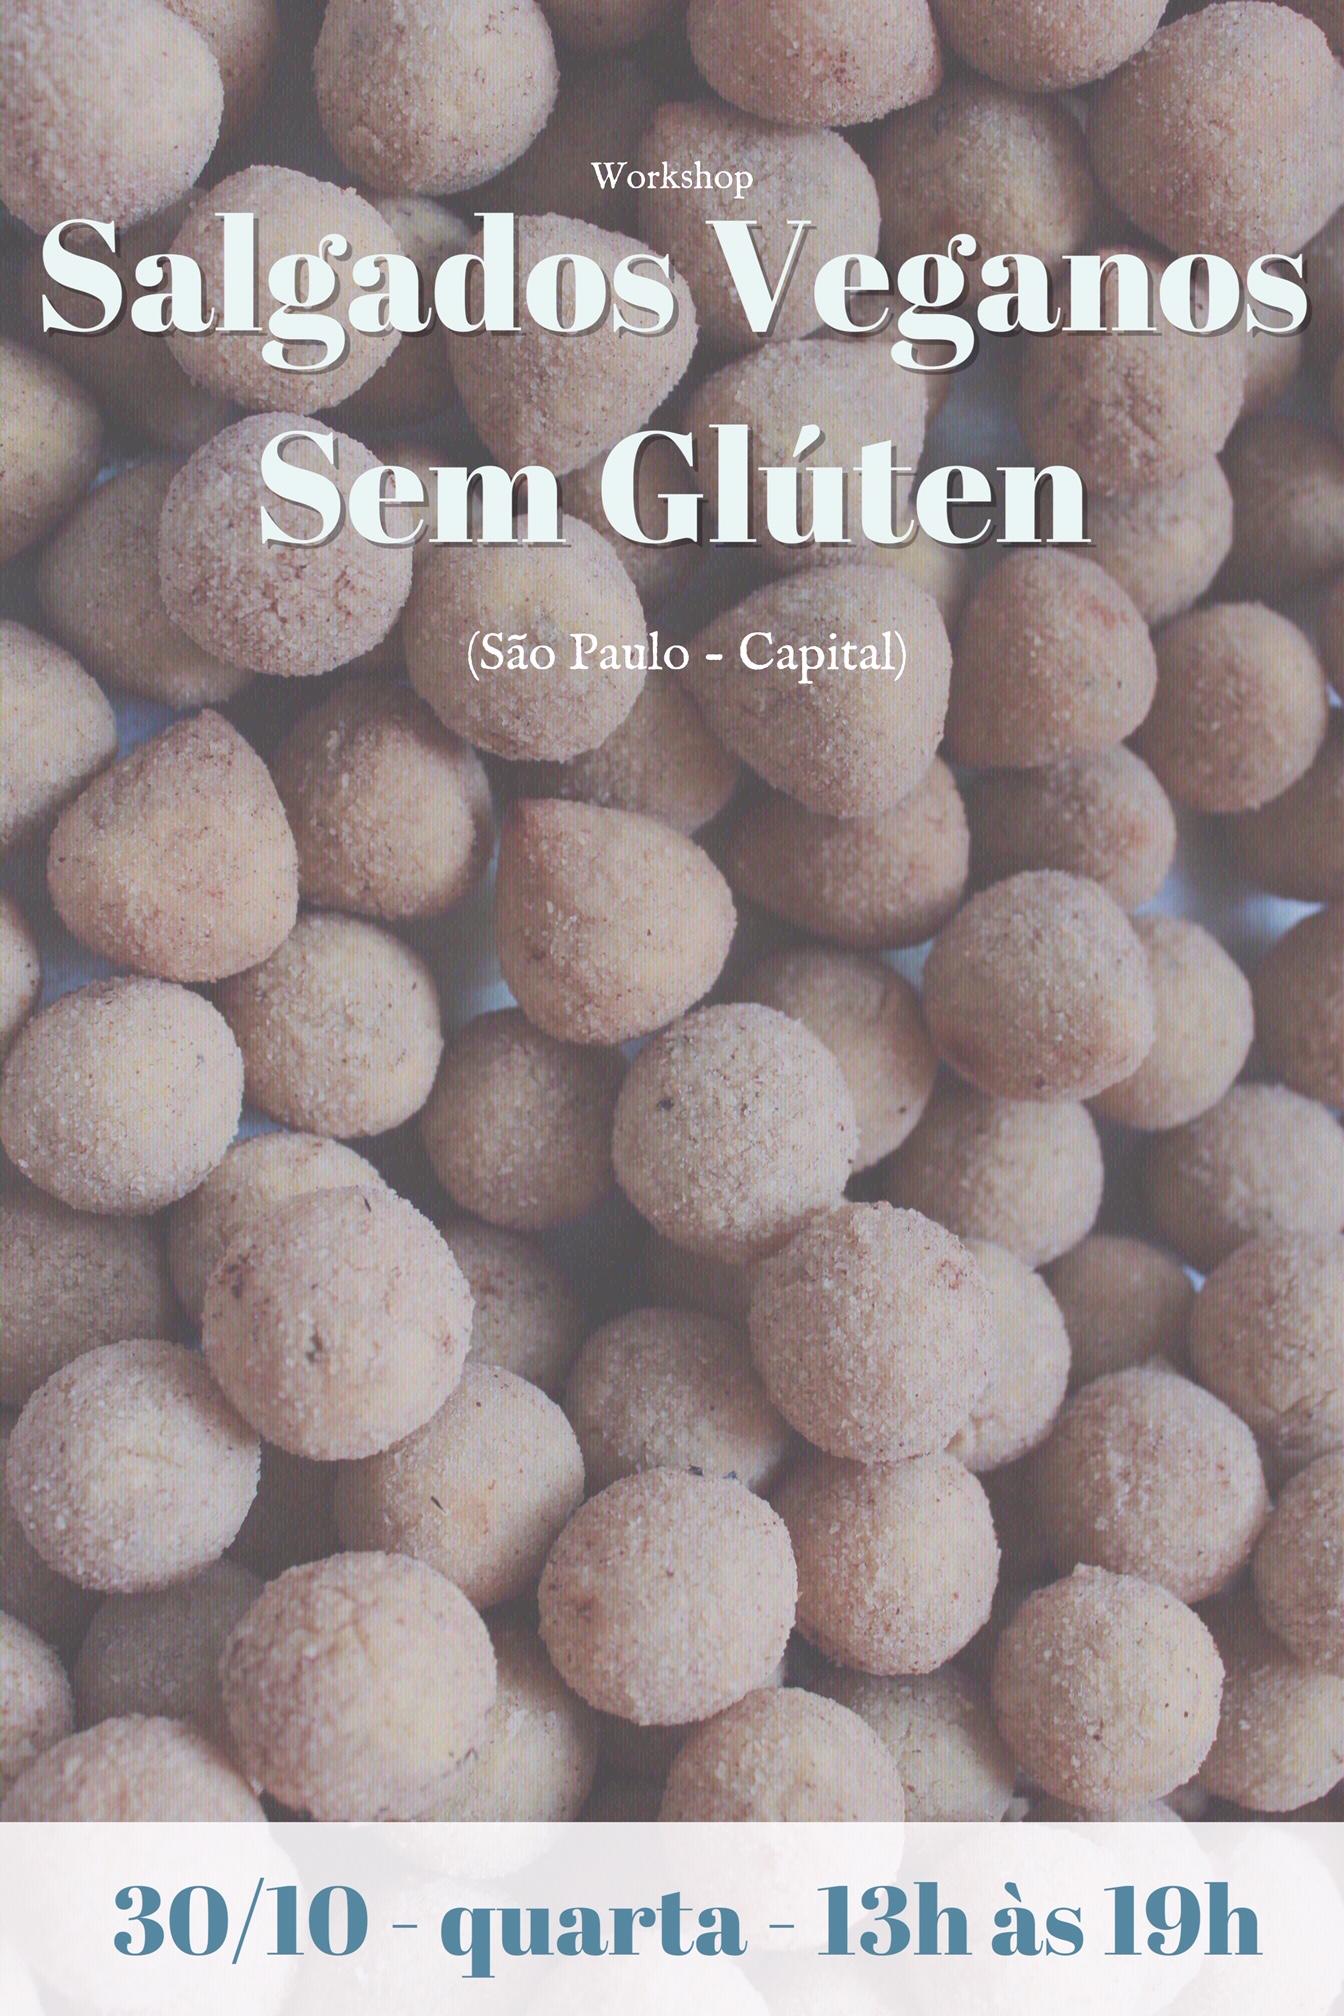 Workshop - Salgados Veganos sem glúten - Módulo II